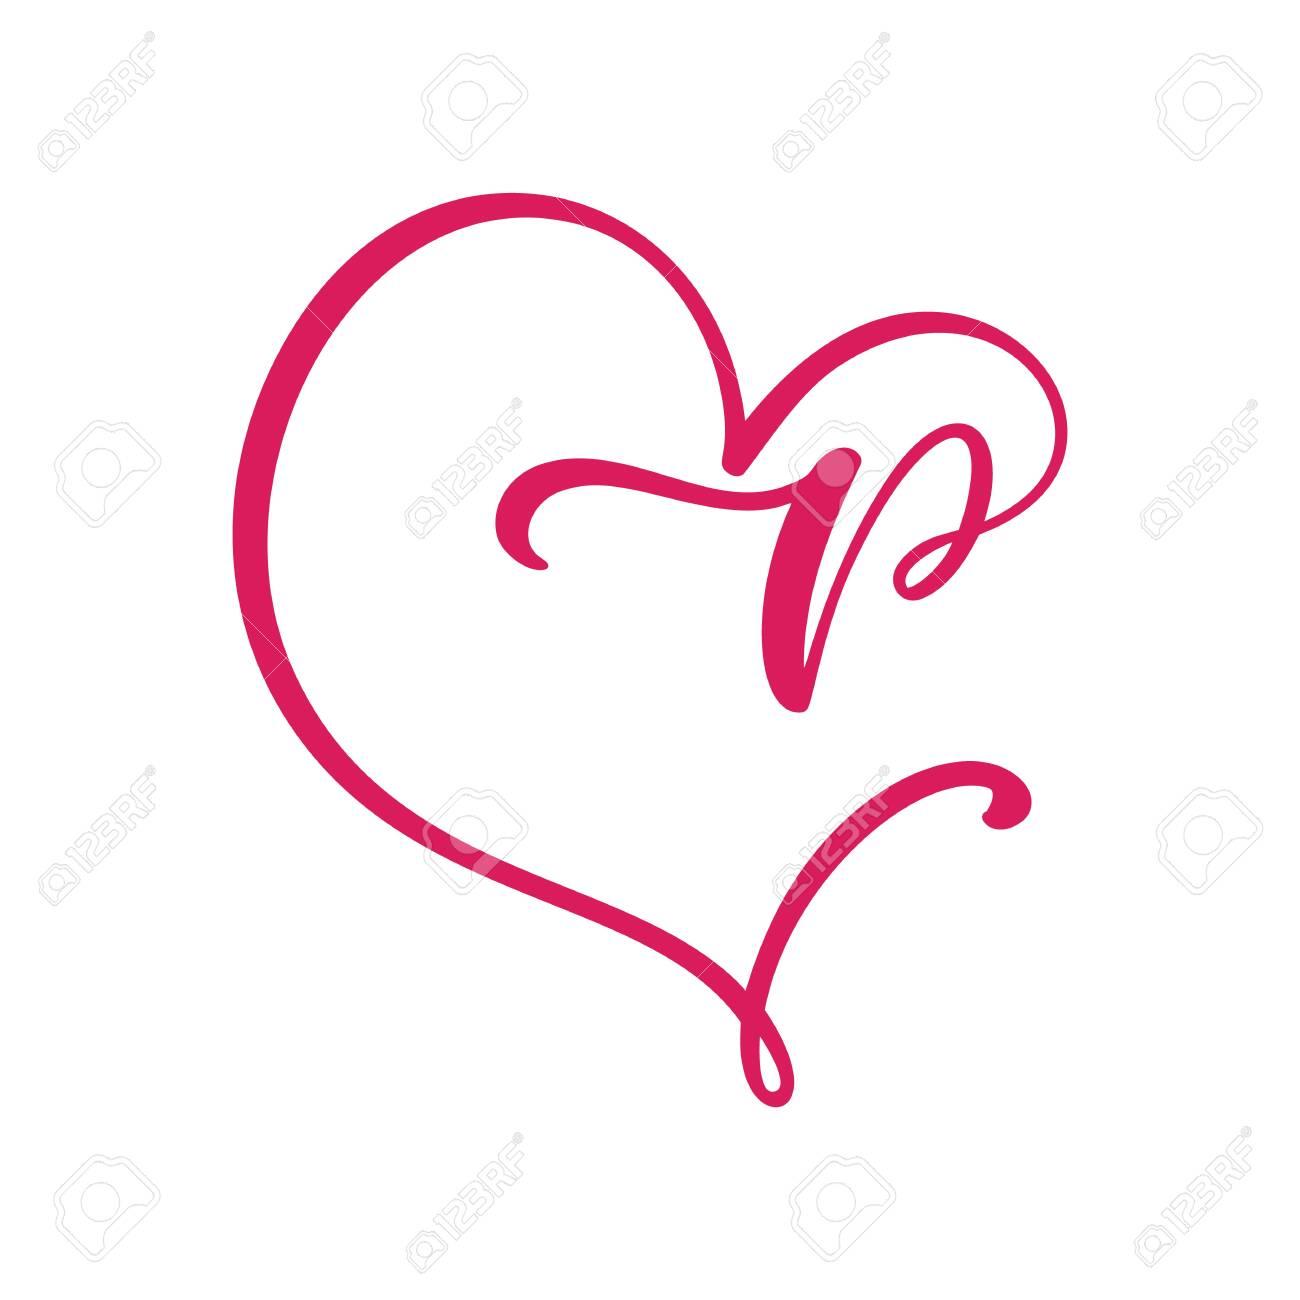 Vector Vintage floral monogram letter P. Calligraphy element Valentine flourish frame. Hand drawn heart sign for page decoration and design illustration. Love wedding card or invitation - 137934251